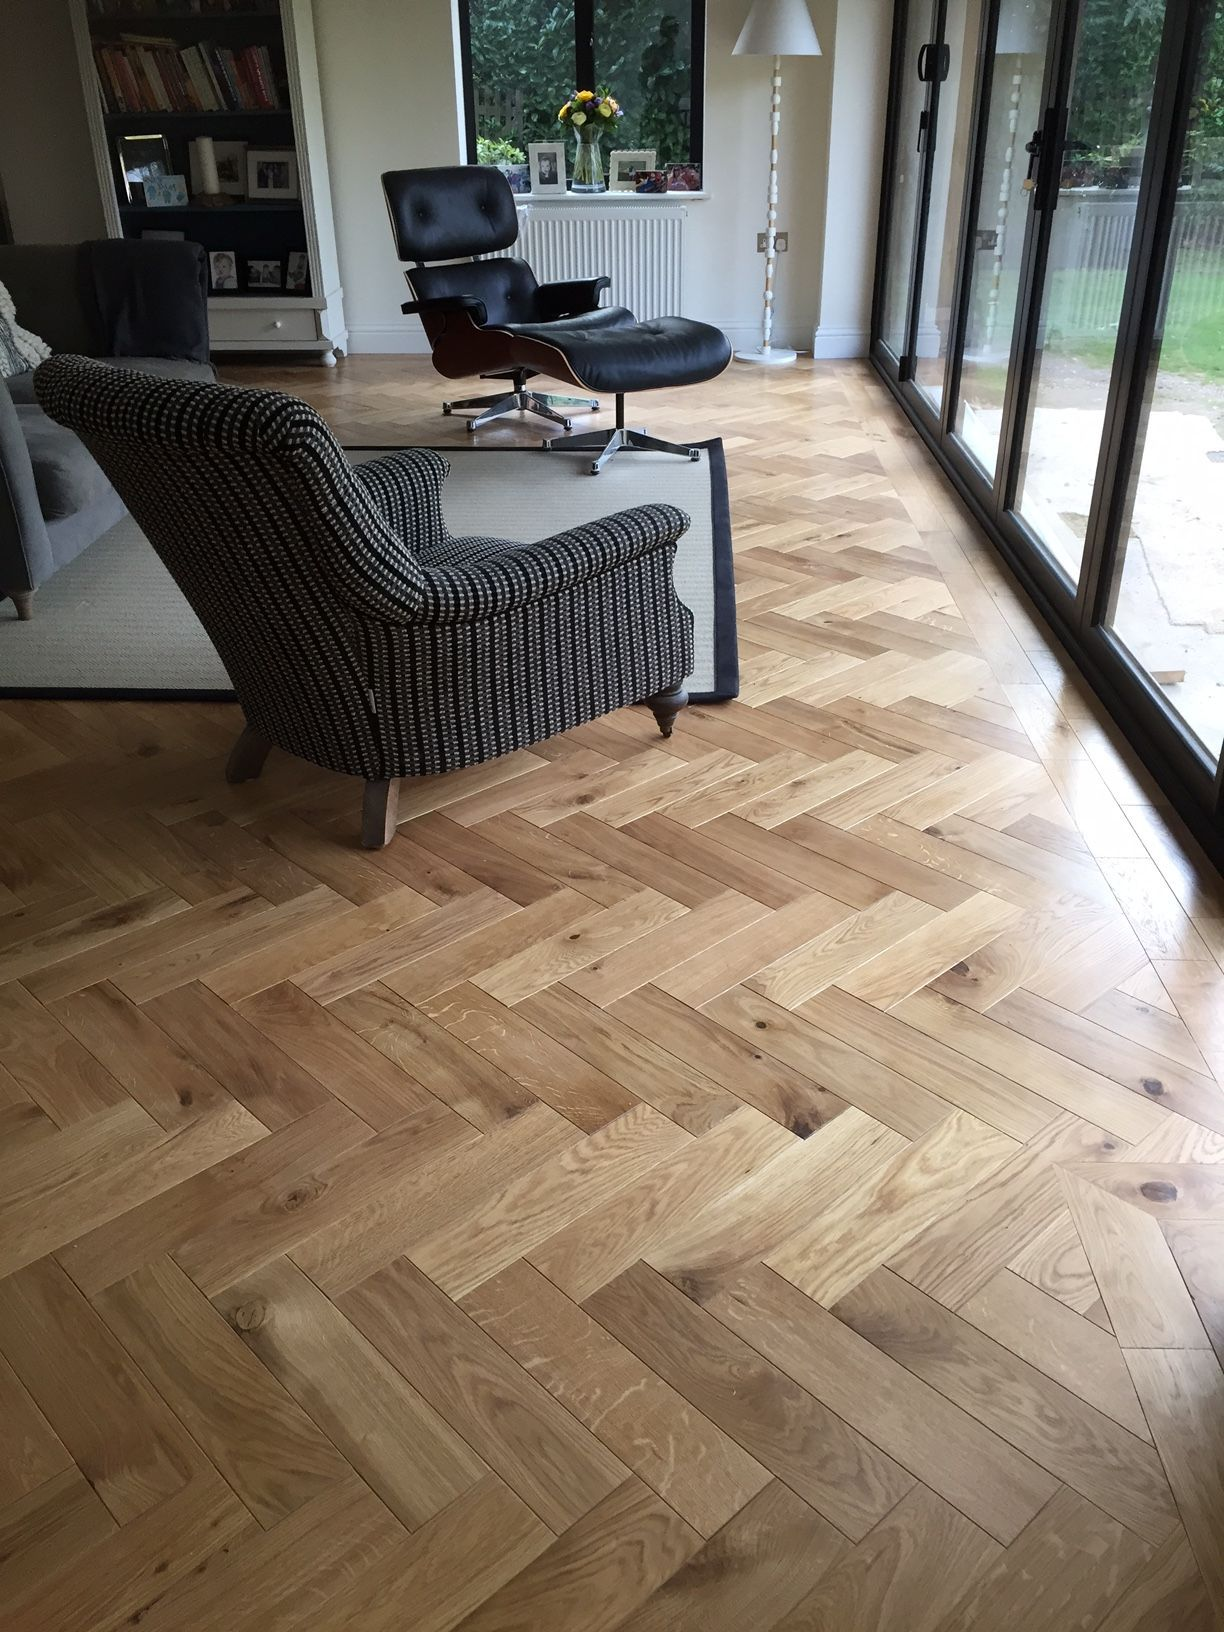 European Engineered Parquet Herringbone Engineered Wood Flooring Bespoke Flooring Hard W Herringbone Wood Floor Wooden Floors Living Room Wood Parquet Flooring